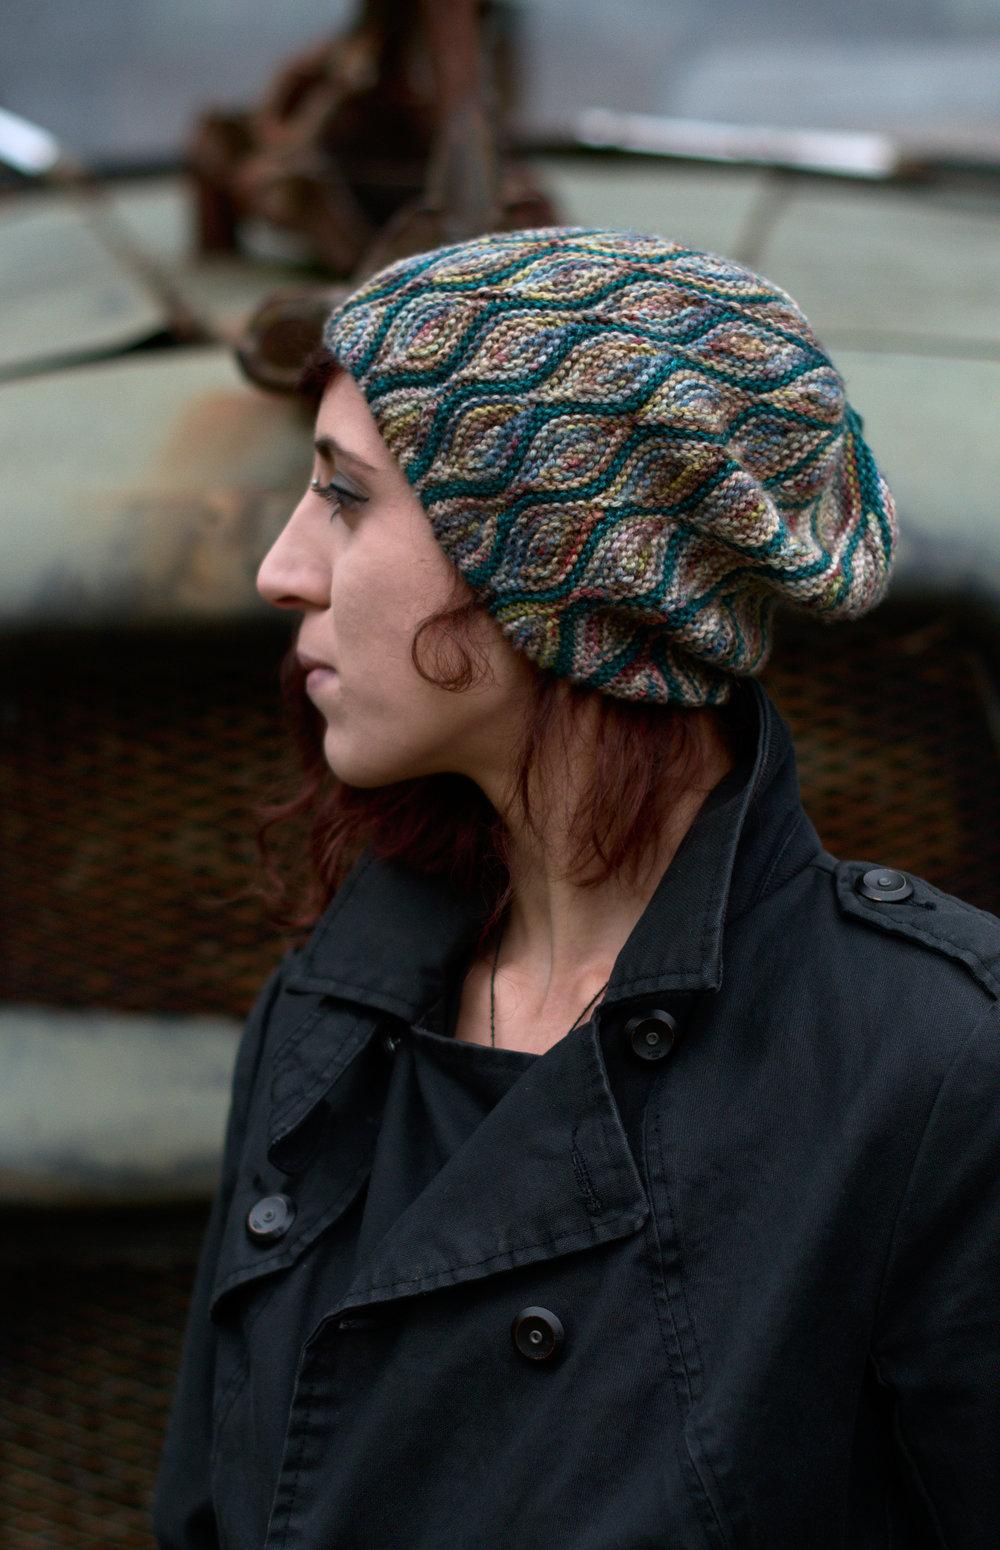 Rhinebeck Hat sideways knit short row hand knitting pattern